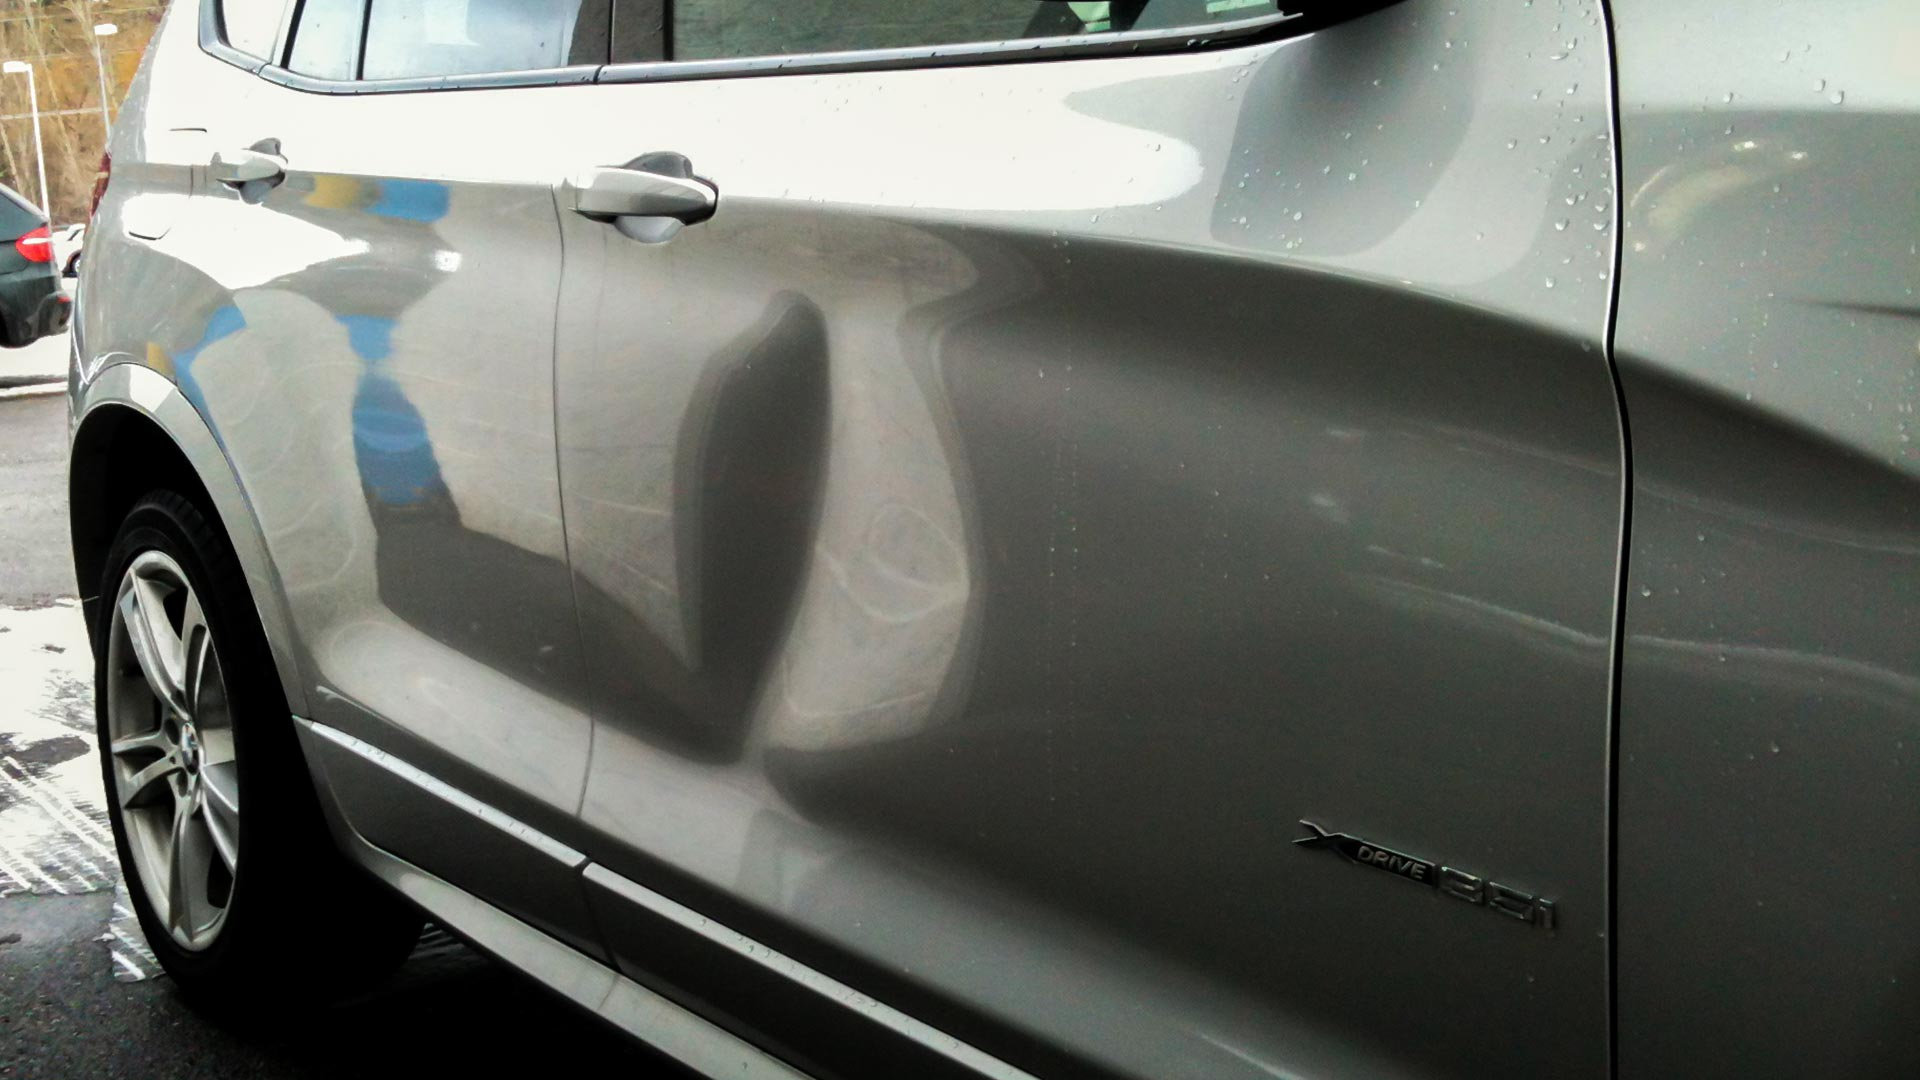 Paintless Dent Repair Cost >> 2013-bmw-x3-door-dent-main - Dentique Paintless Dent Repair